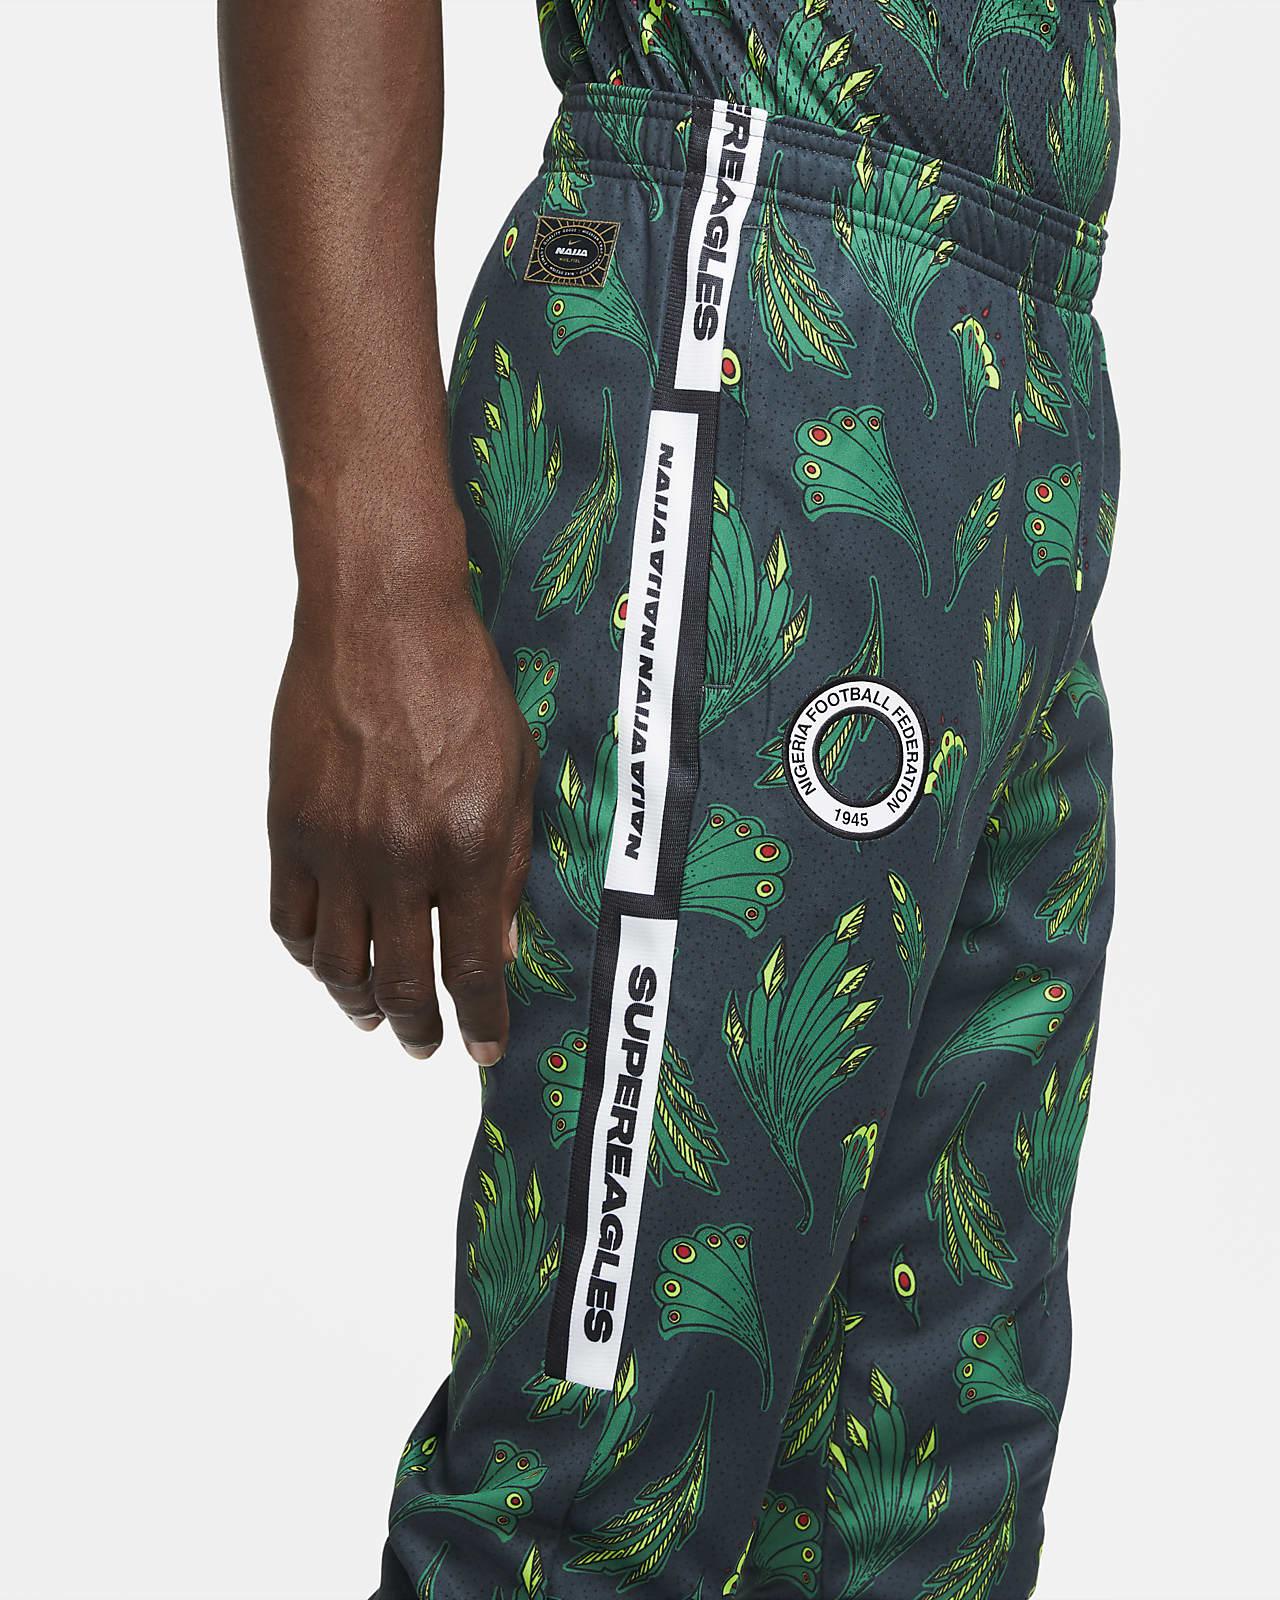 Nigeria kort fotballjakke til dame. Nike NO